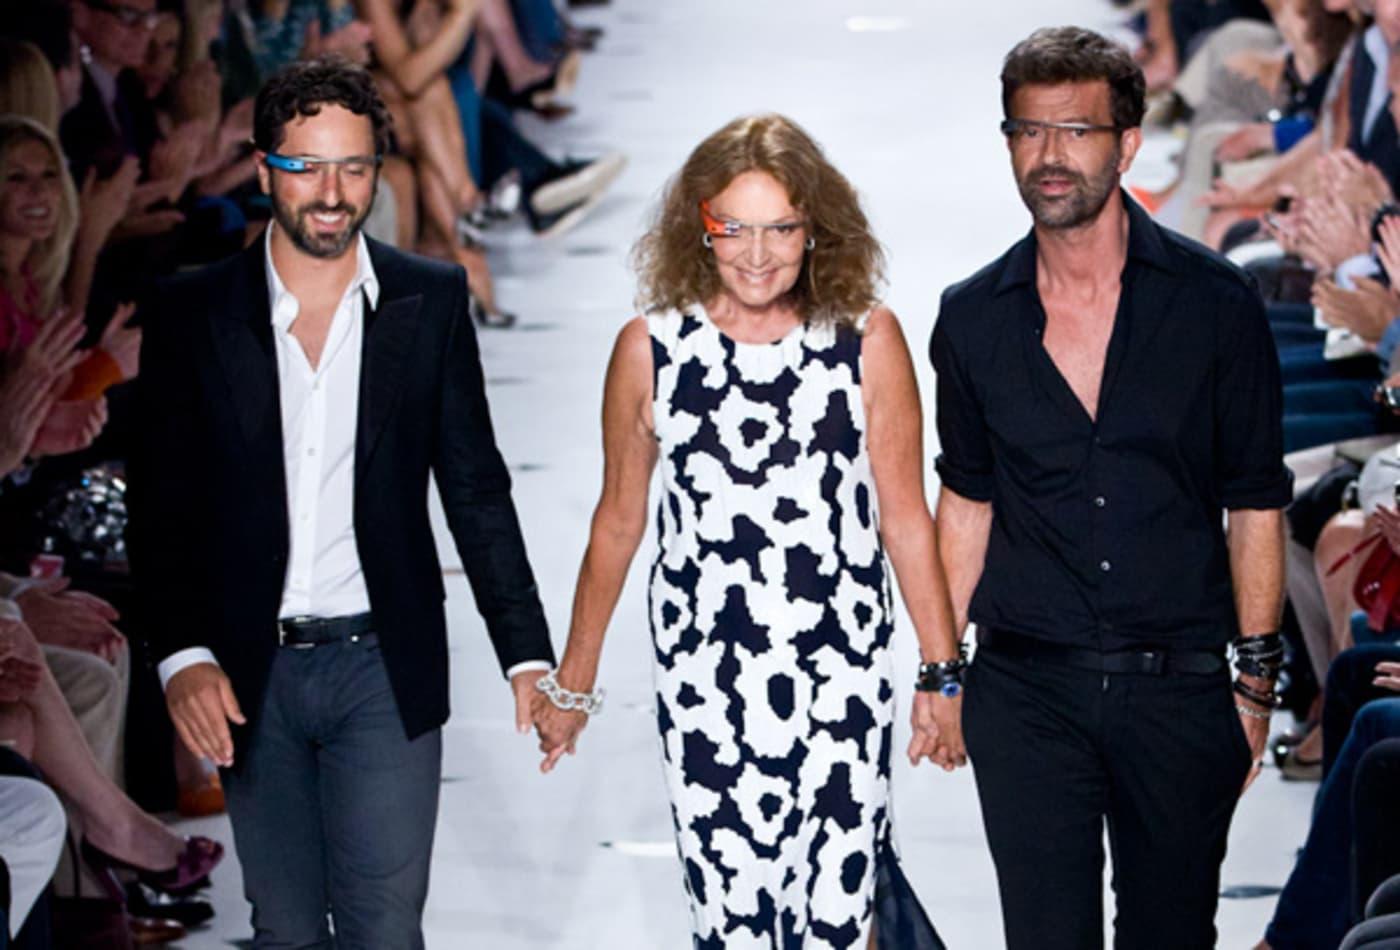 Mercedes-Benz-Fashion-week-2012-dvf-google-ceo.jpg